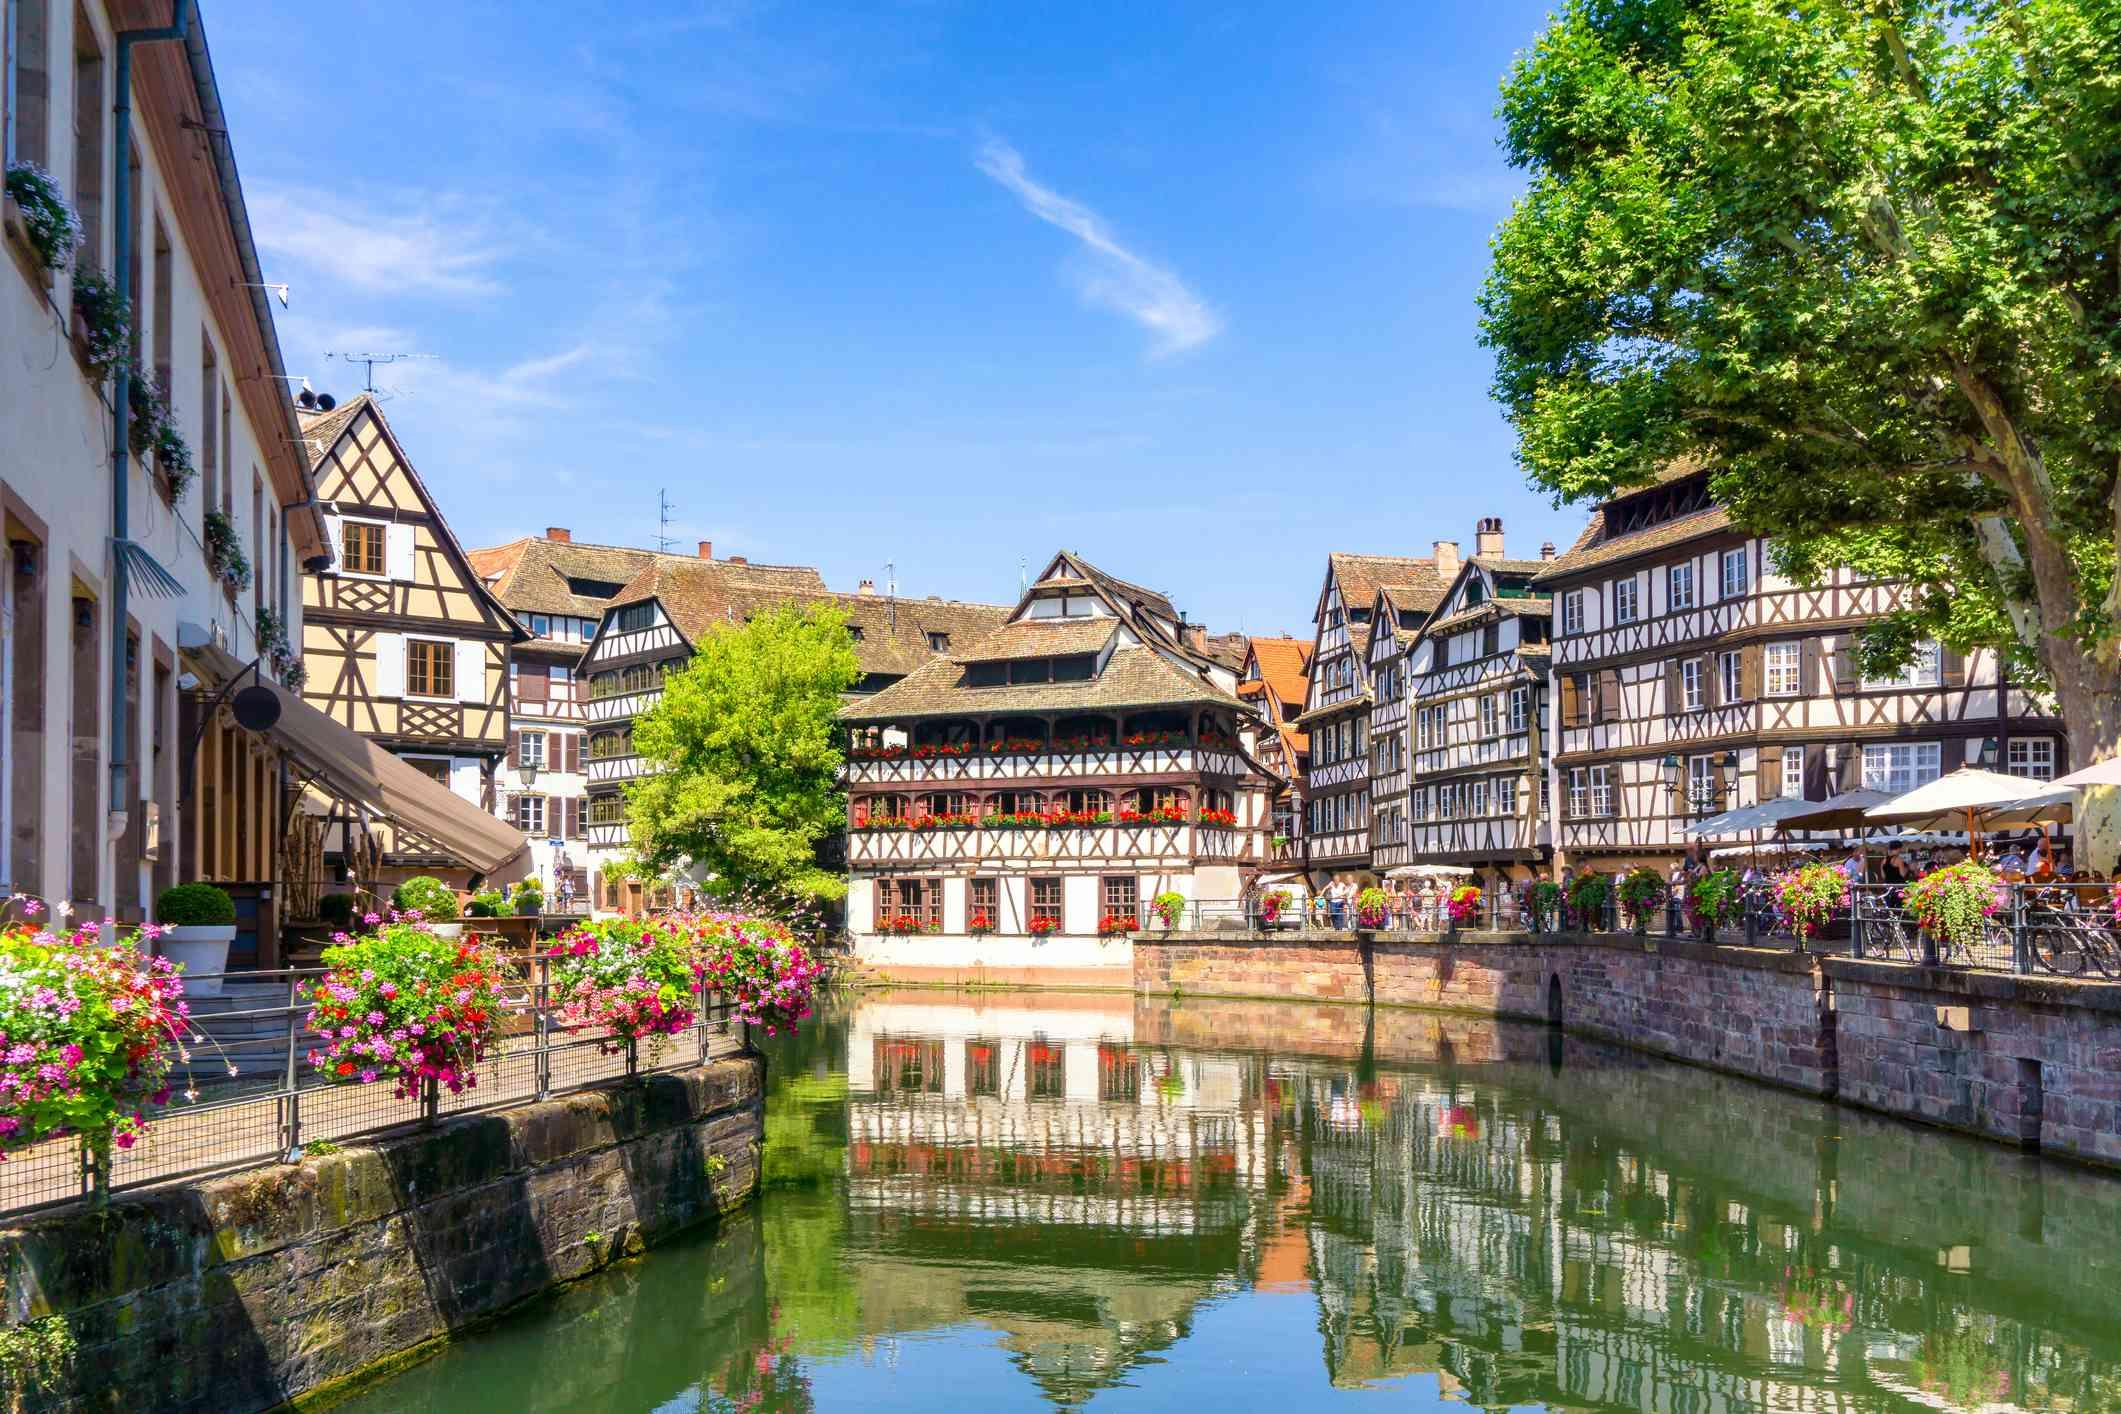 The Petit France district, Strasbourg